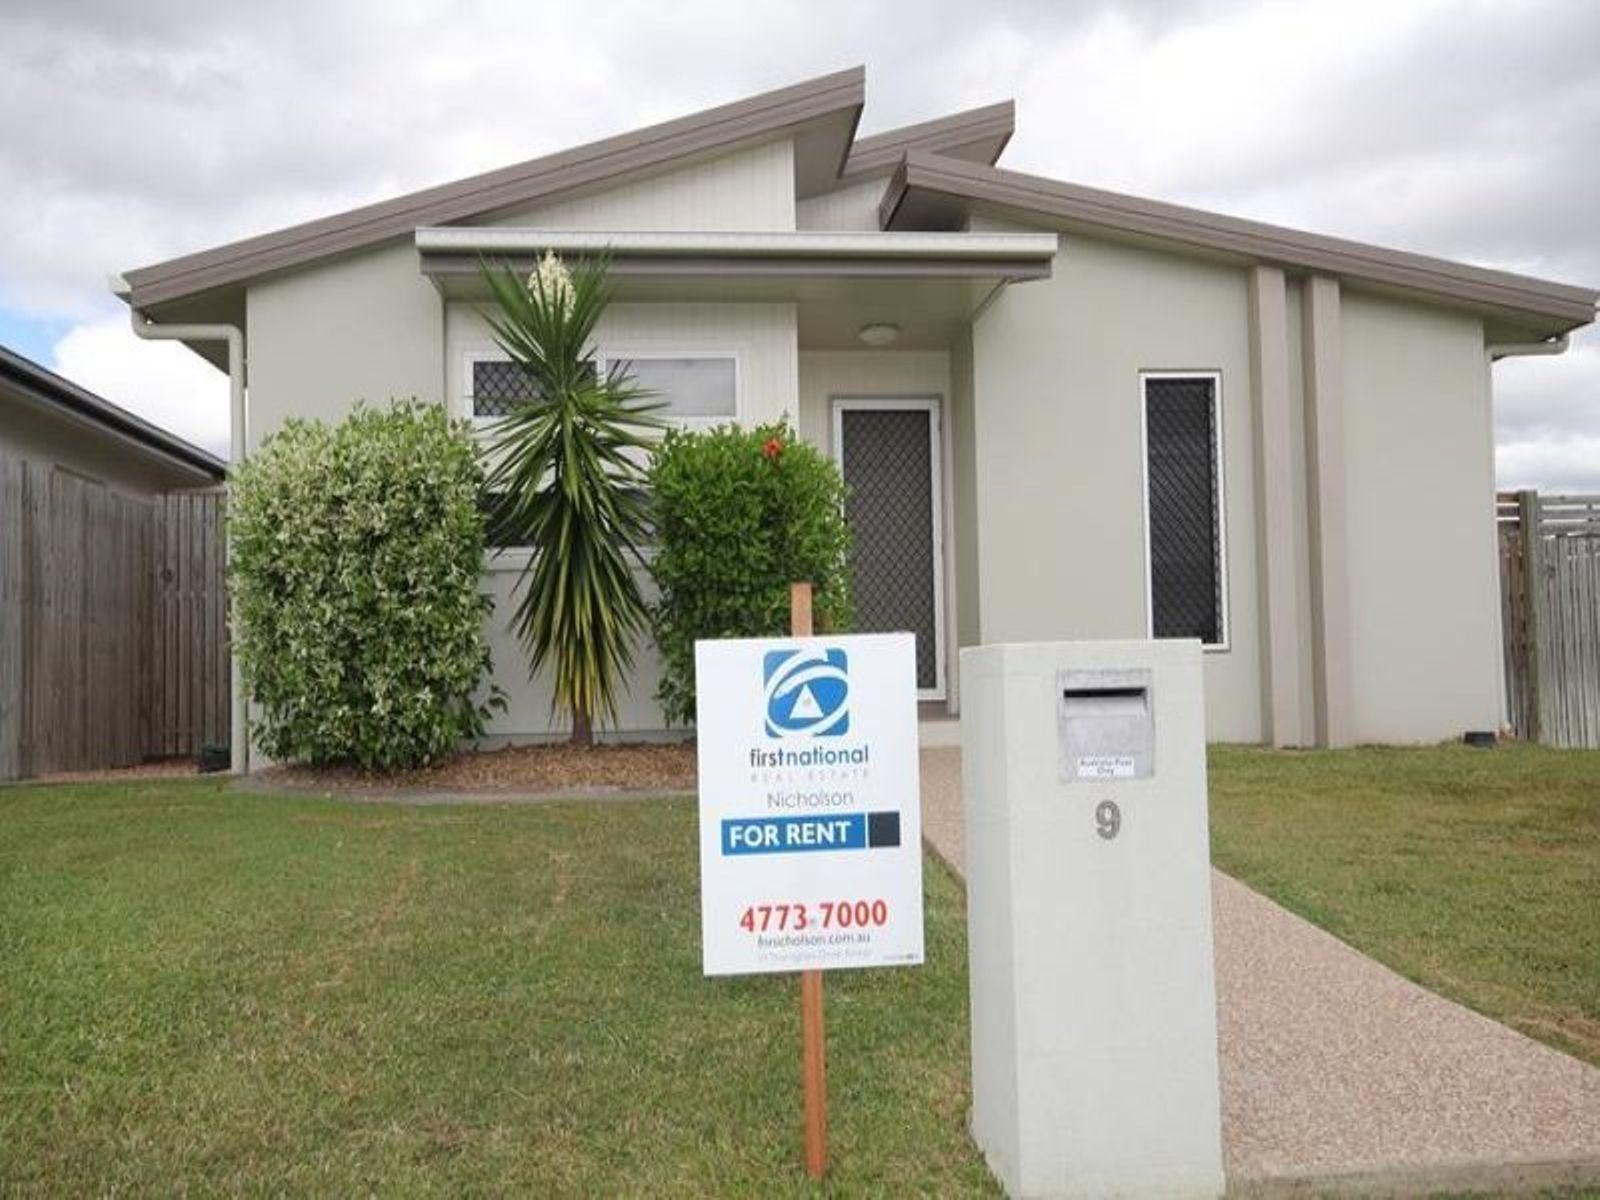 9 Treecreeper Street, Bohle Plains, QLD 4817